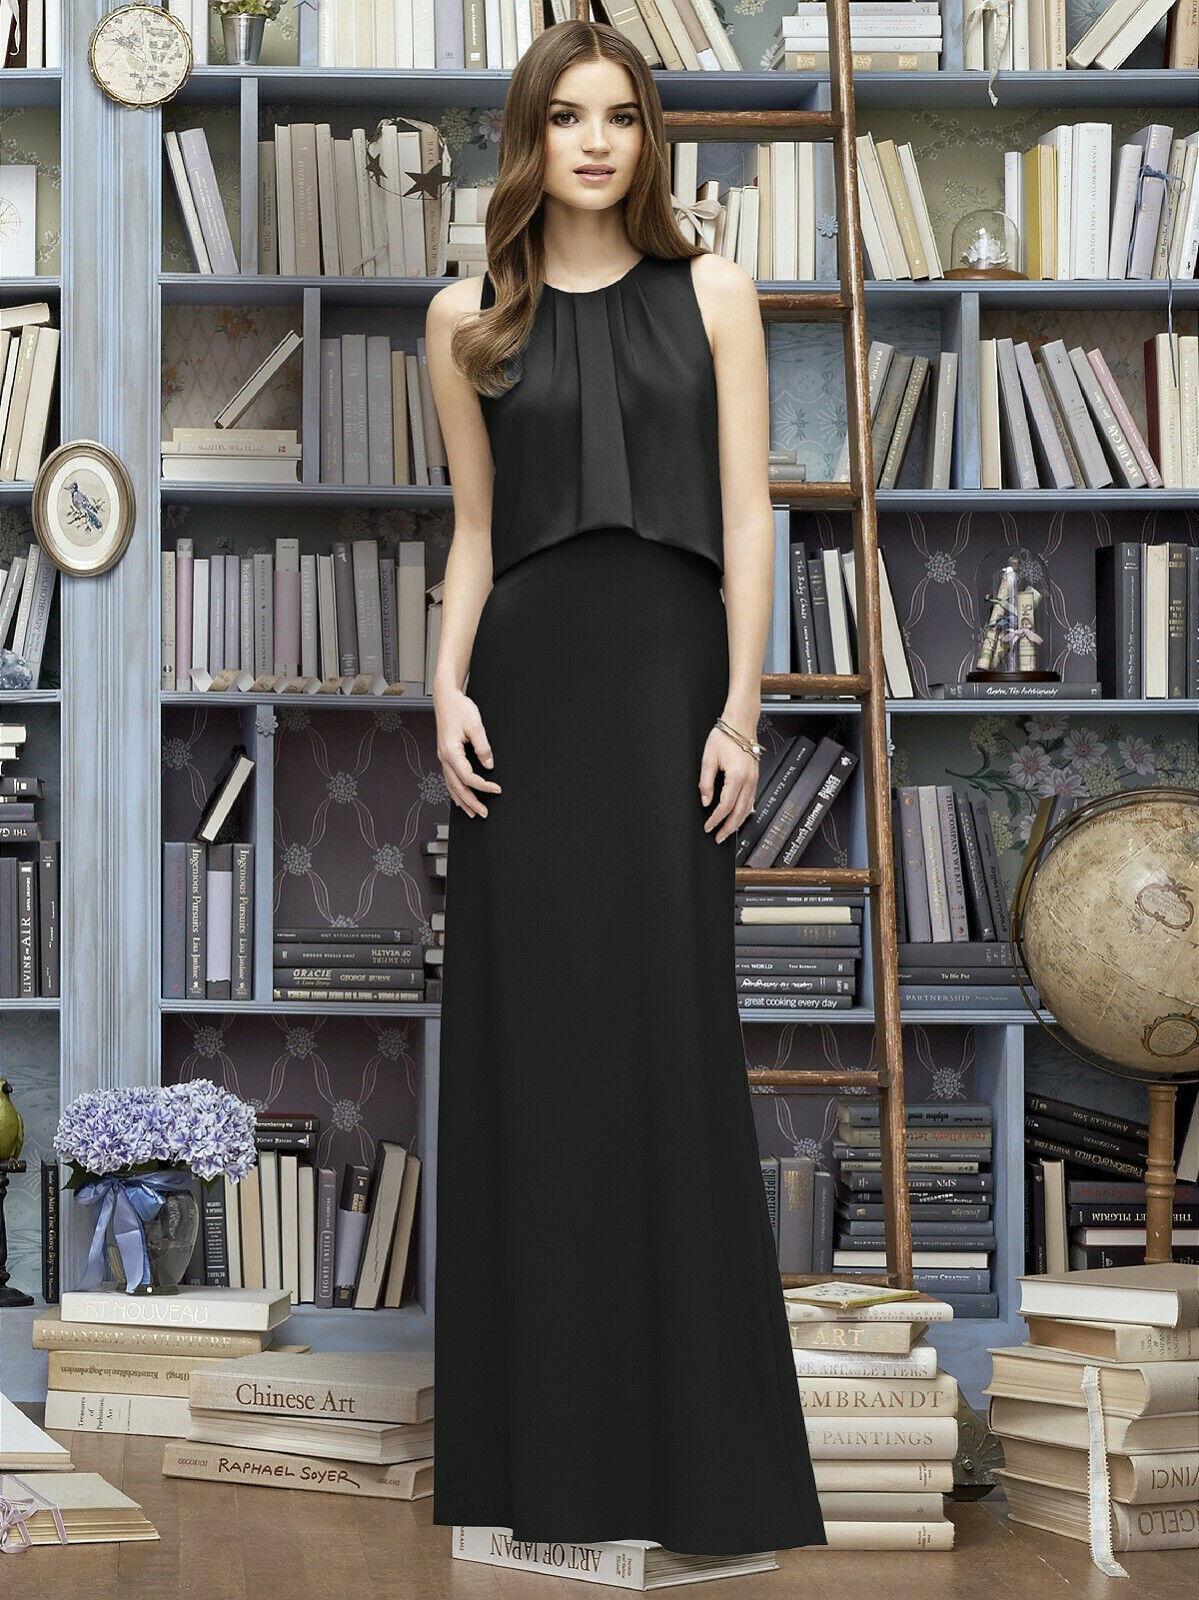 Lela Rose Bridesmaid M 8 Black Formal Evening Gown Crepe trumpet mermaid Dress